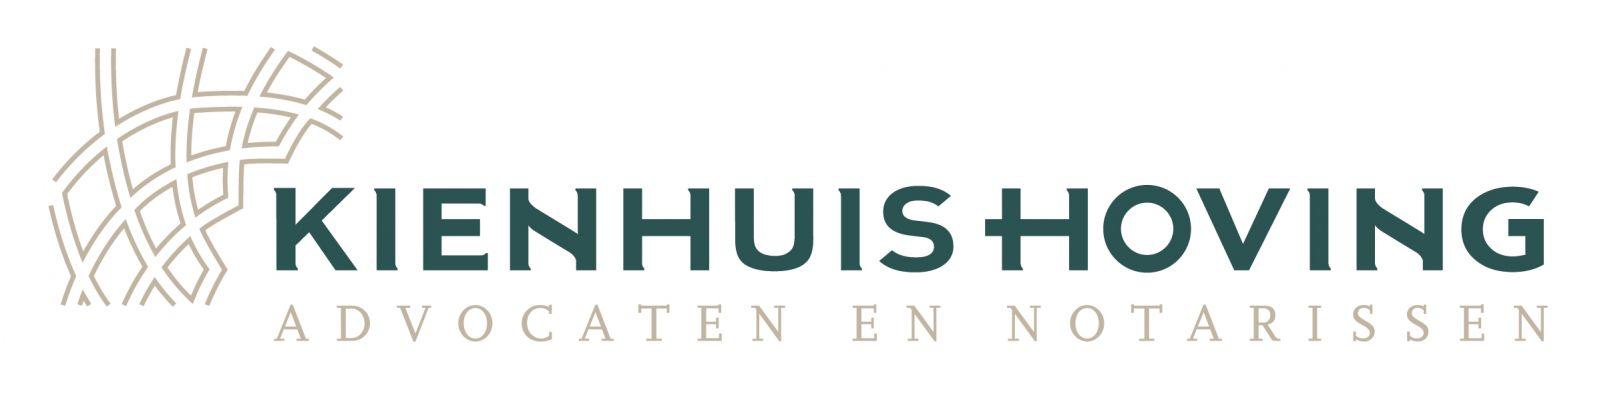 Logo KienhuisHoving